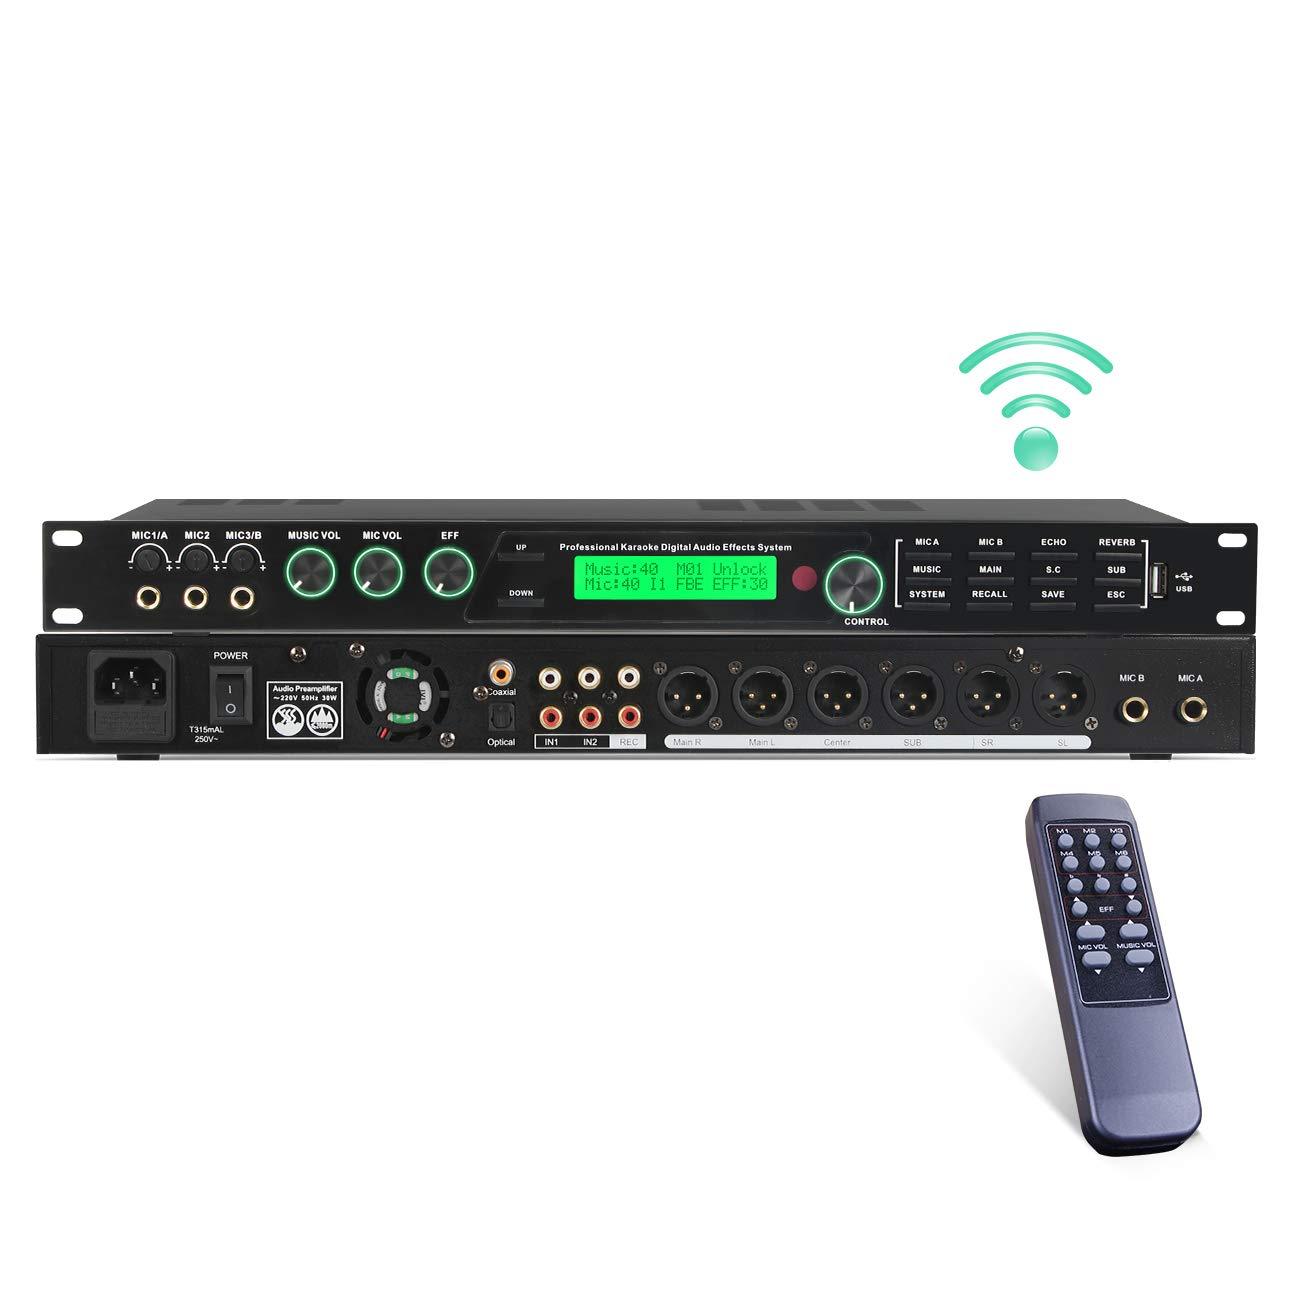 Depusheng REV50 High Performance Digital Reverb and Effects Processor for Music Equipment